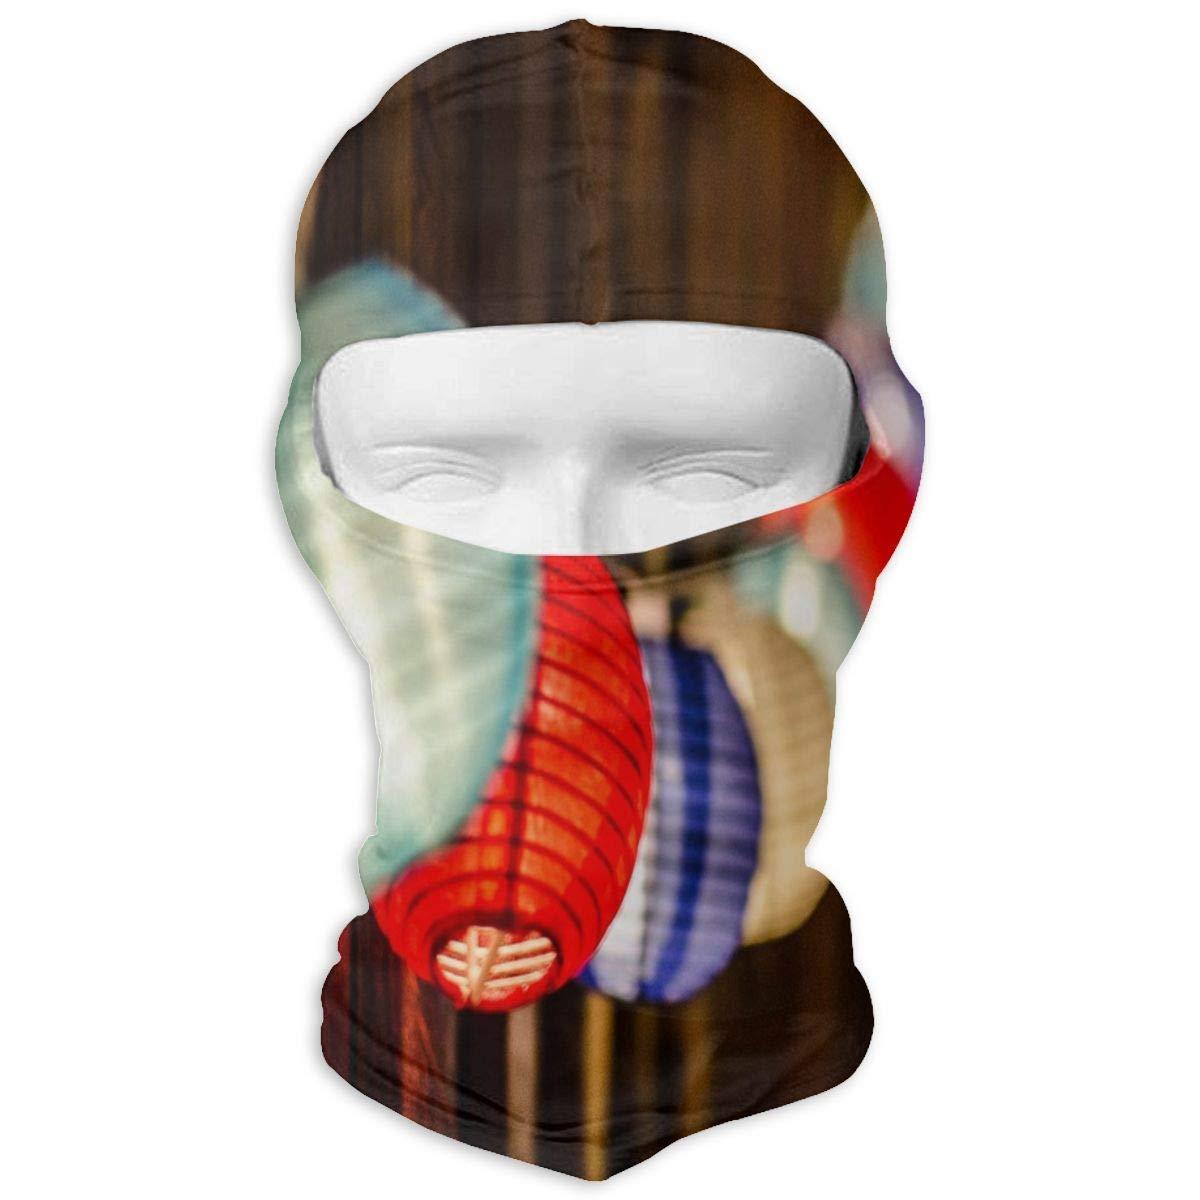 Sdltkhy Balaclava Coffee Beans and Cups Full Face Masks UV ...